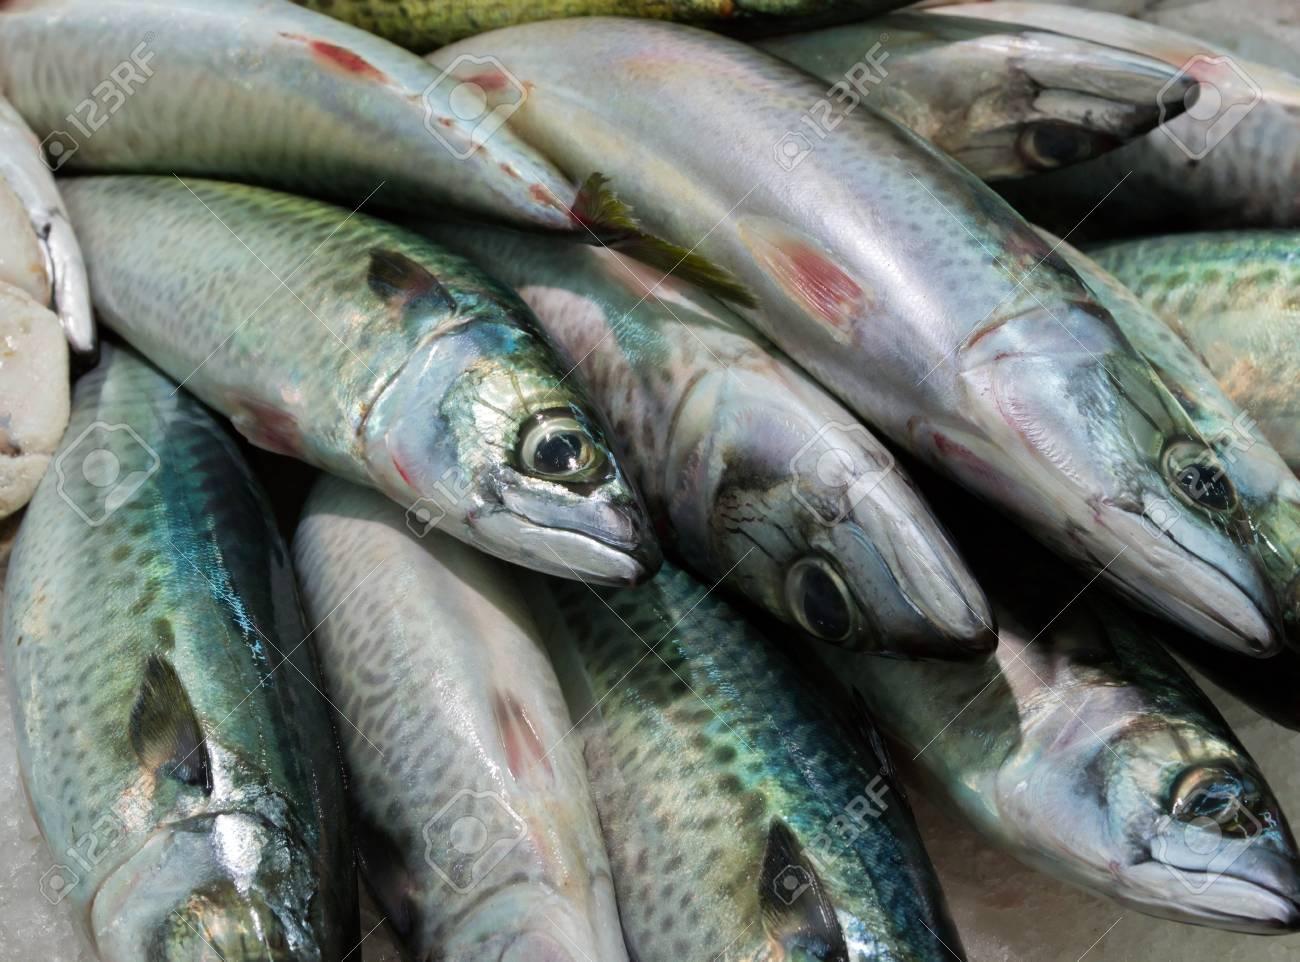 mackerel,sardines - sea food on ice background Stock Photo - 16712430